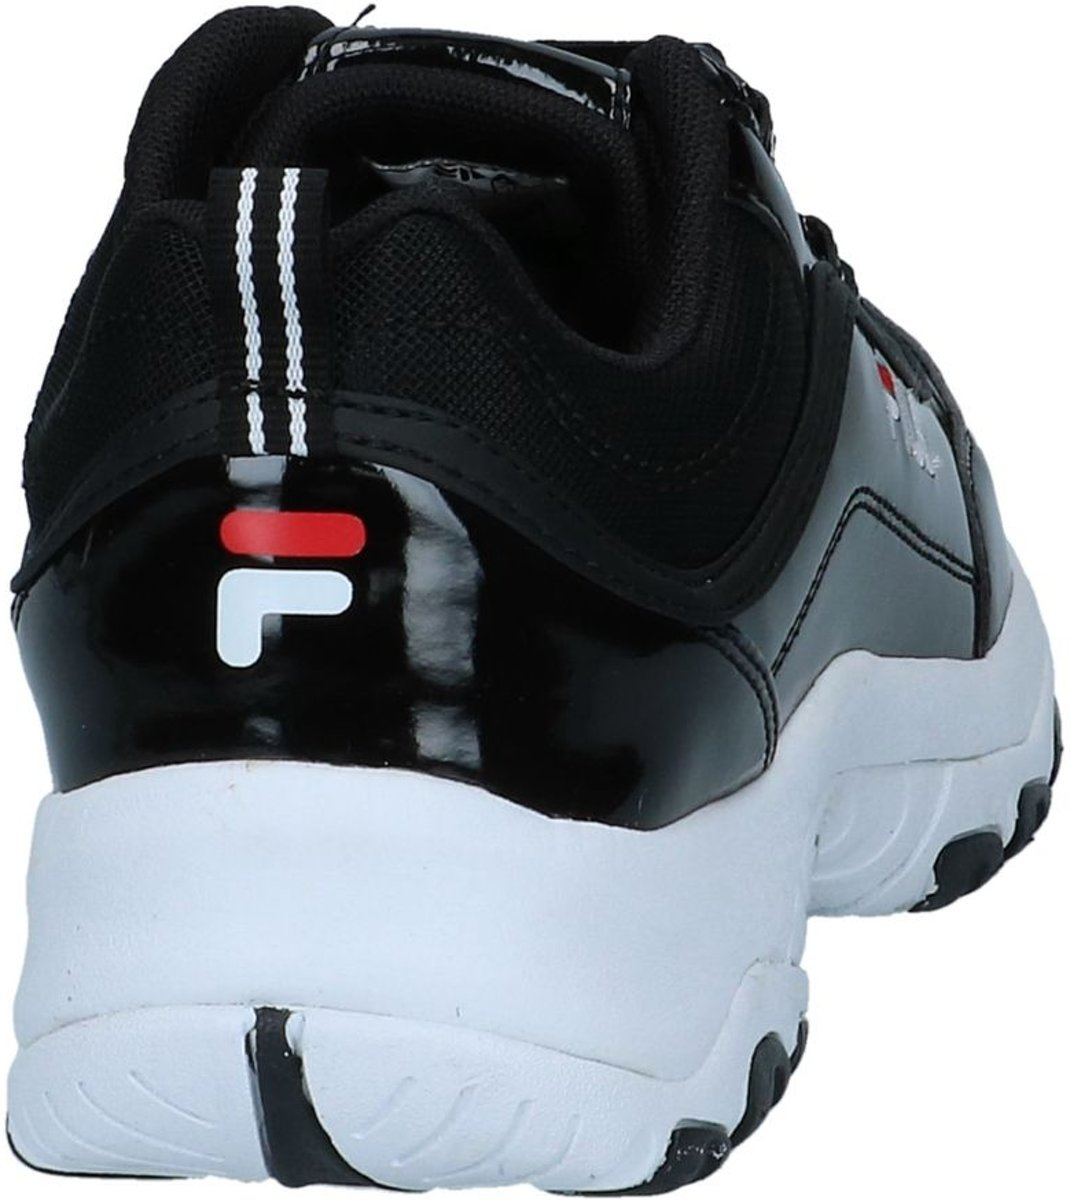 f4e500b4e5d bol.com | Fila - Strada Low - Sneaker laag gekleed - Dames - Maat 39 -  Zwart;Zwarte - 25Y -Black